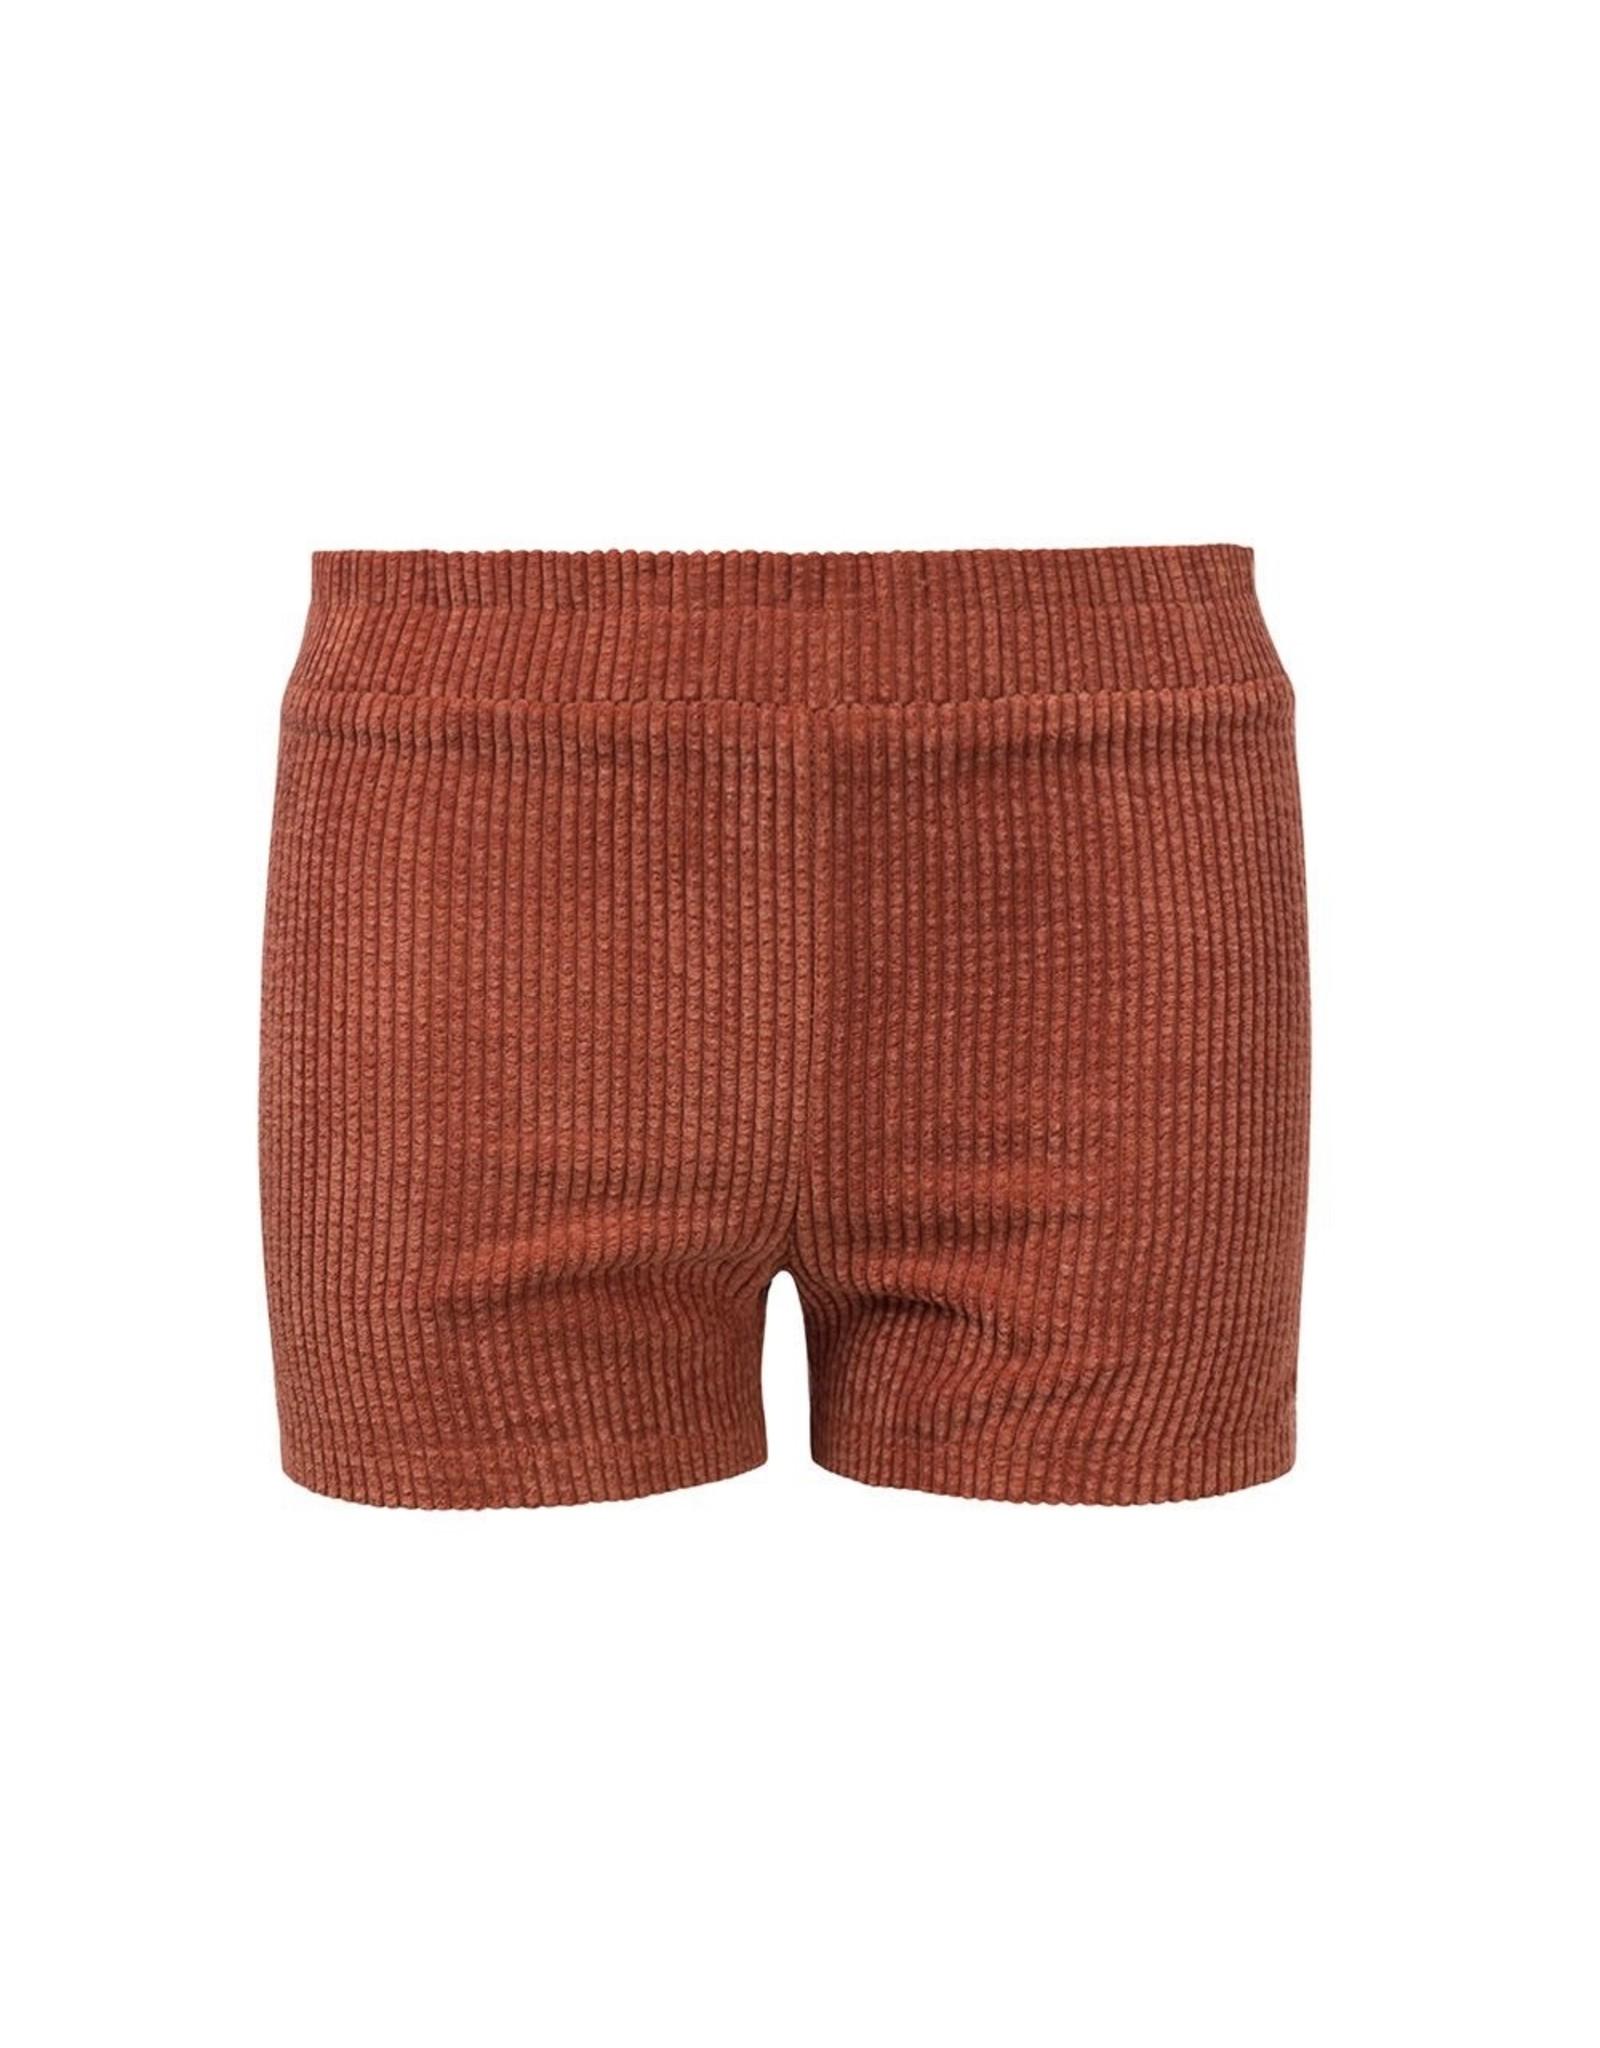 looxs 2132-7669 Pants